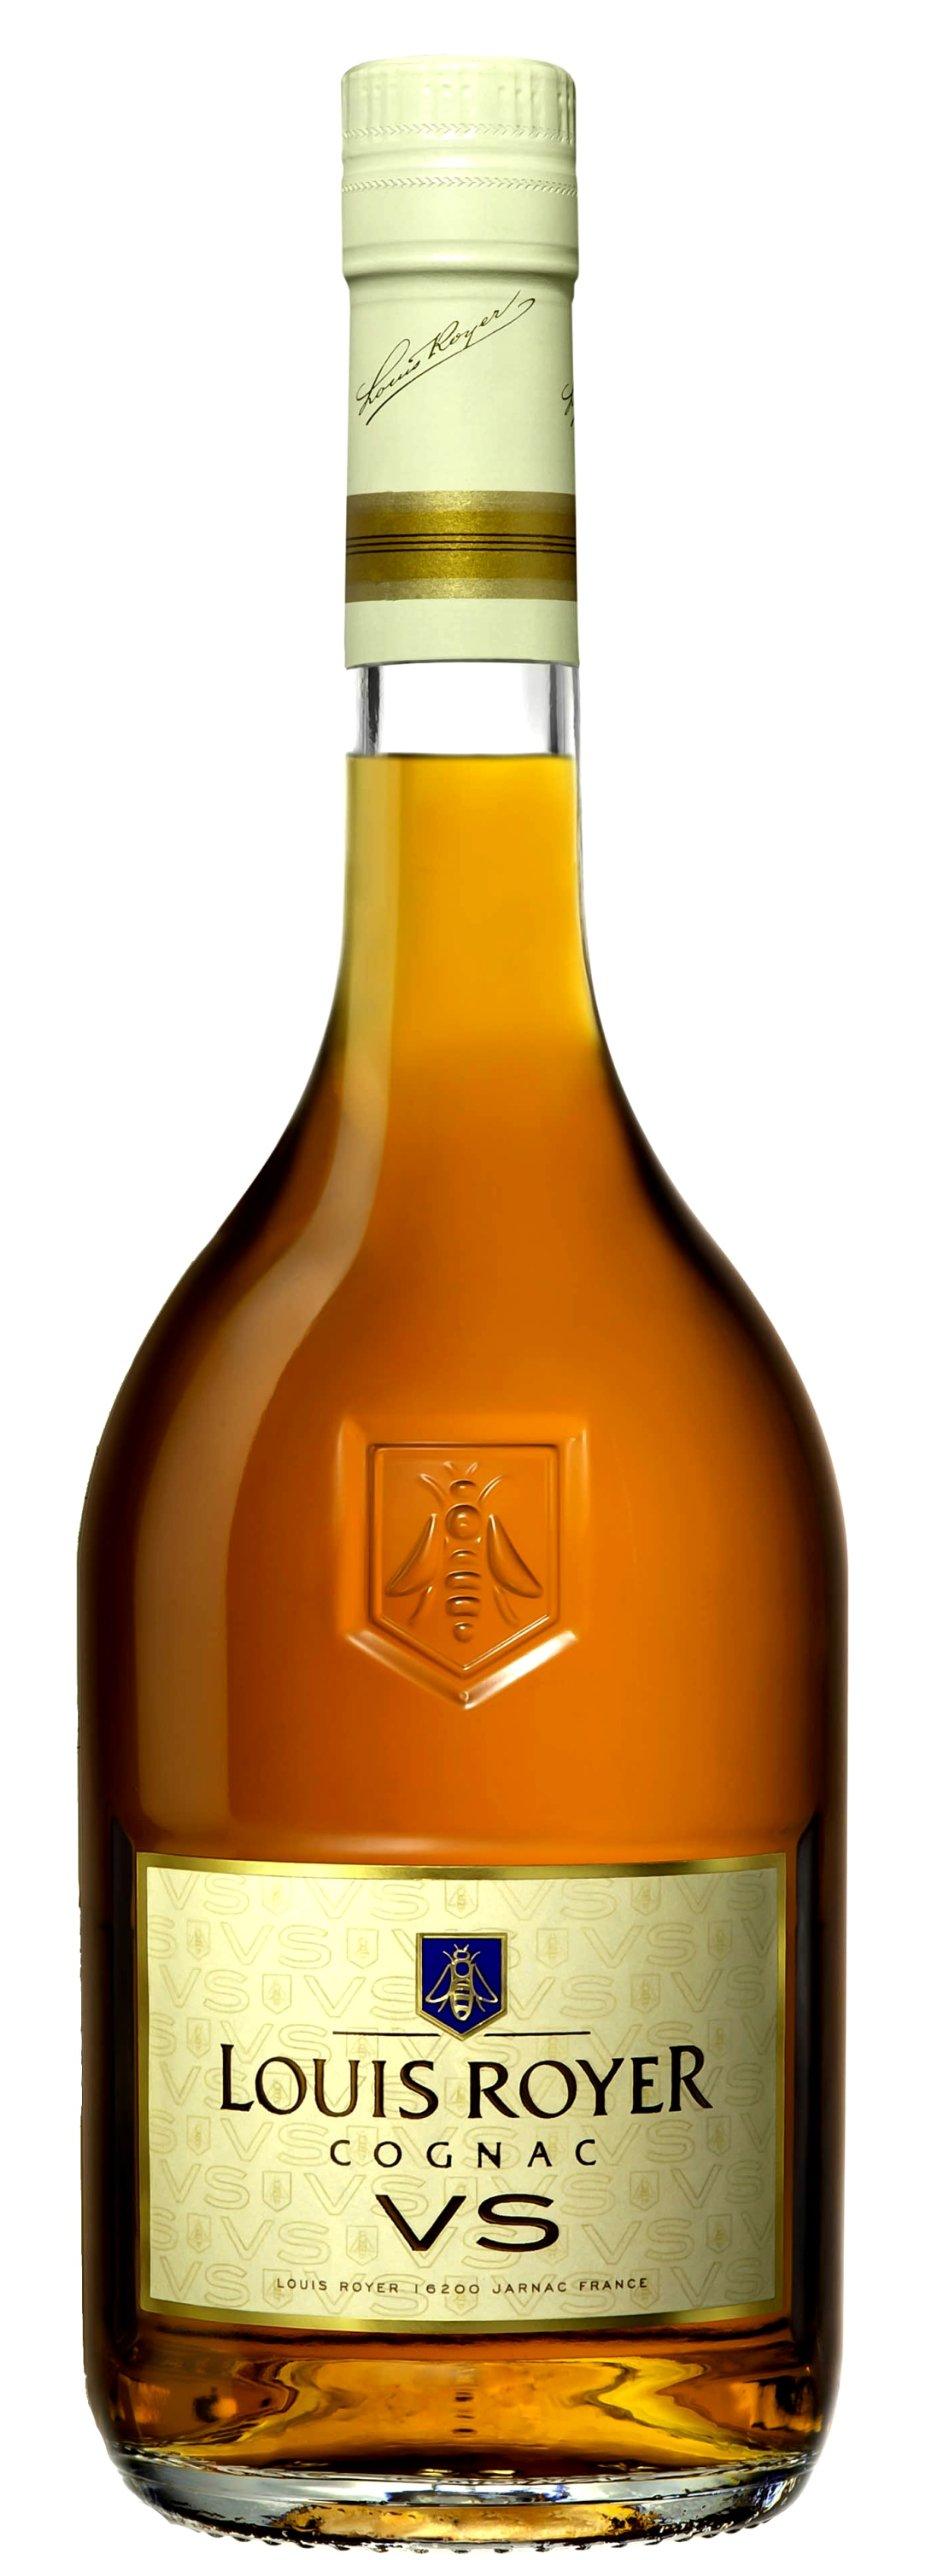 Louis-Royer-VS-Cognac-07-Liter-40-Vol